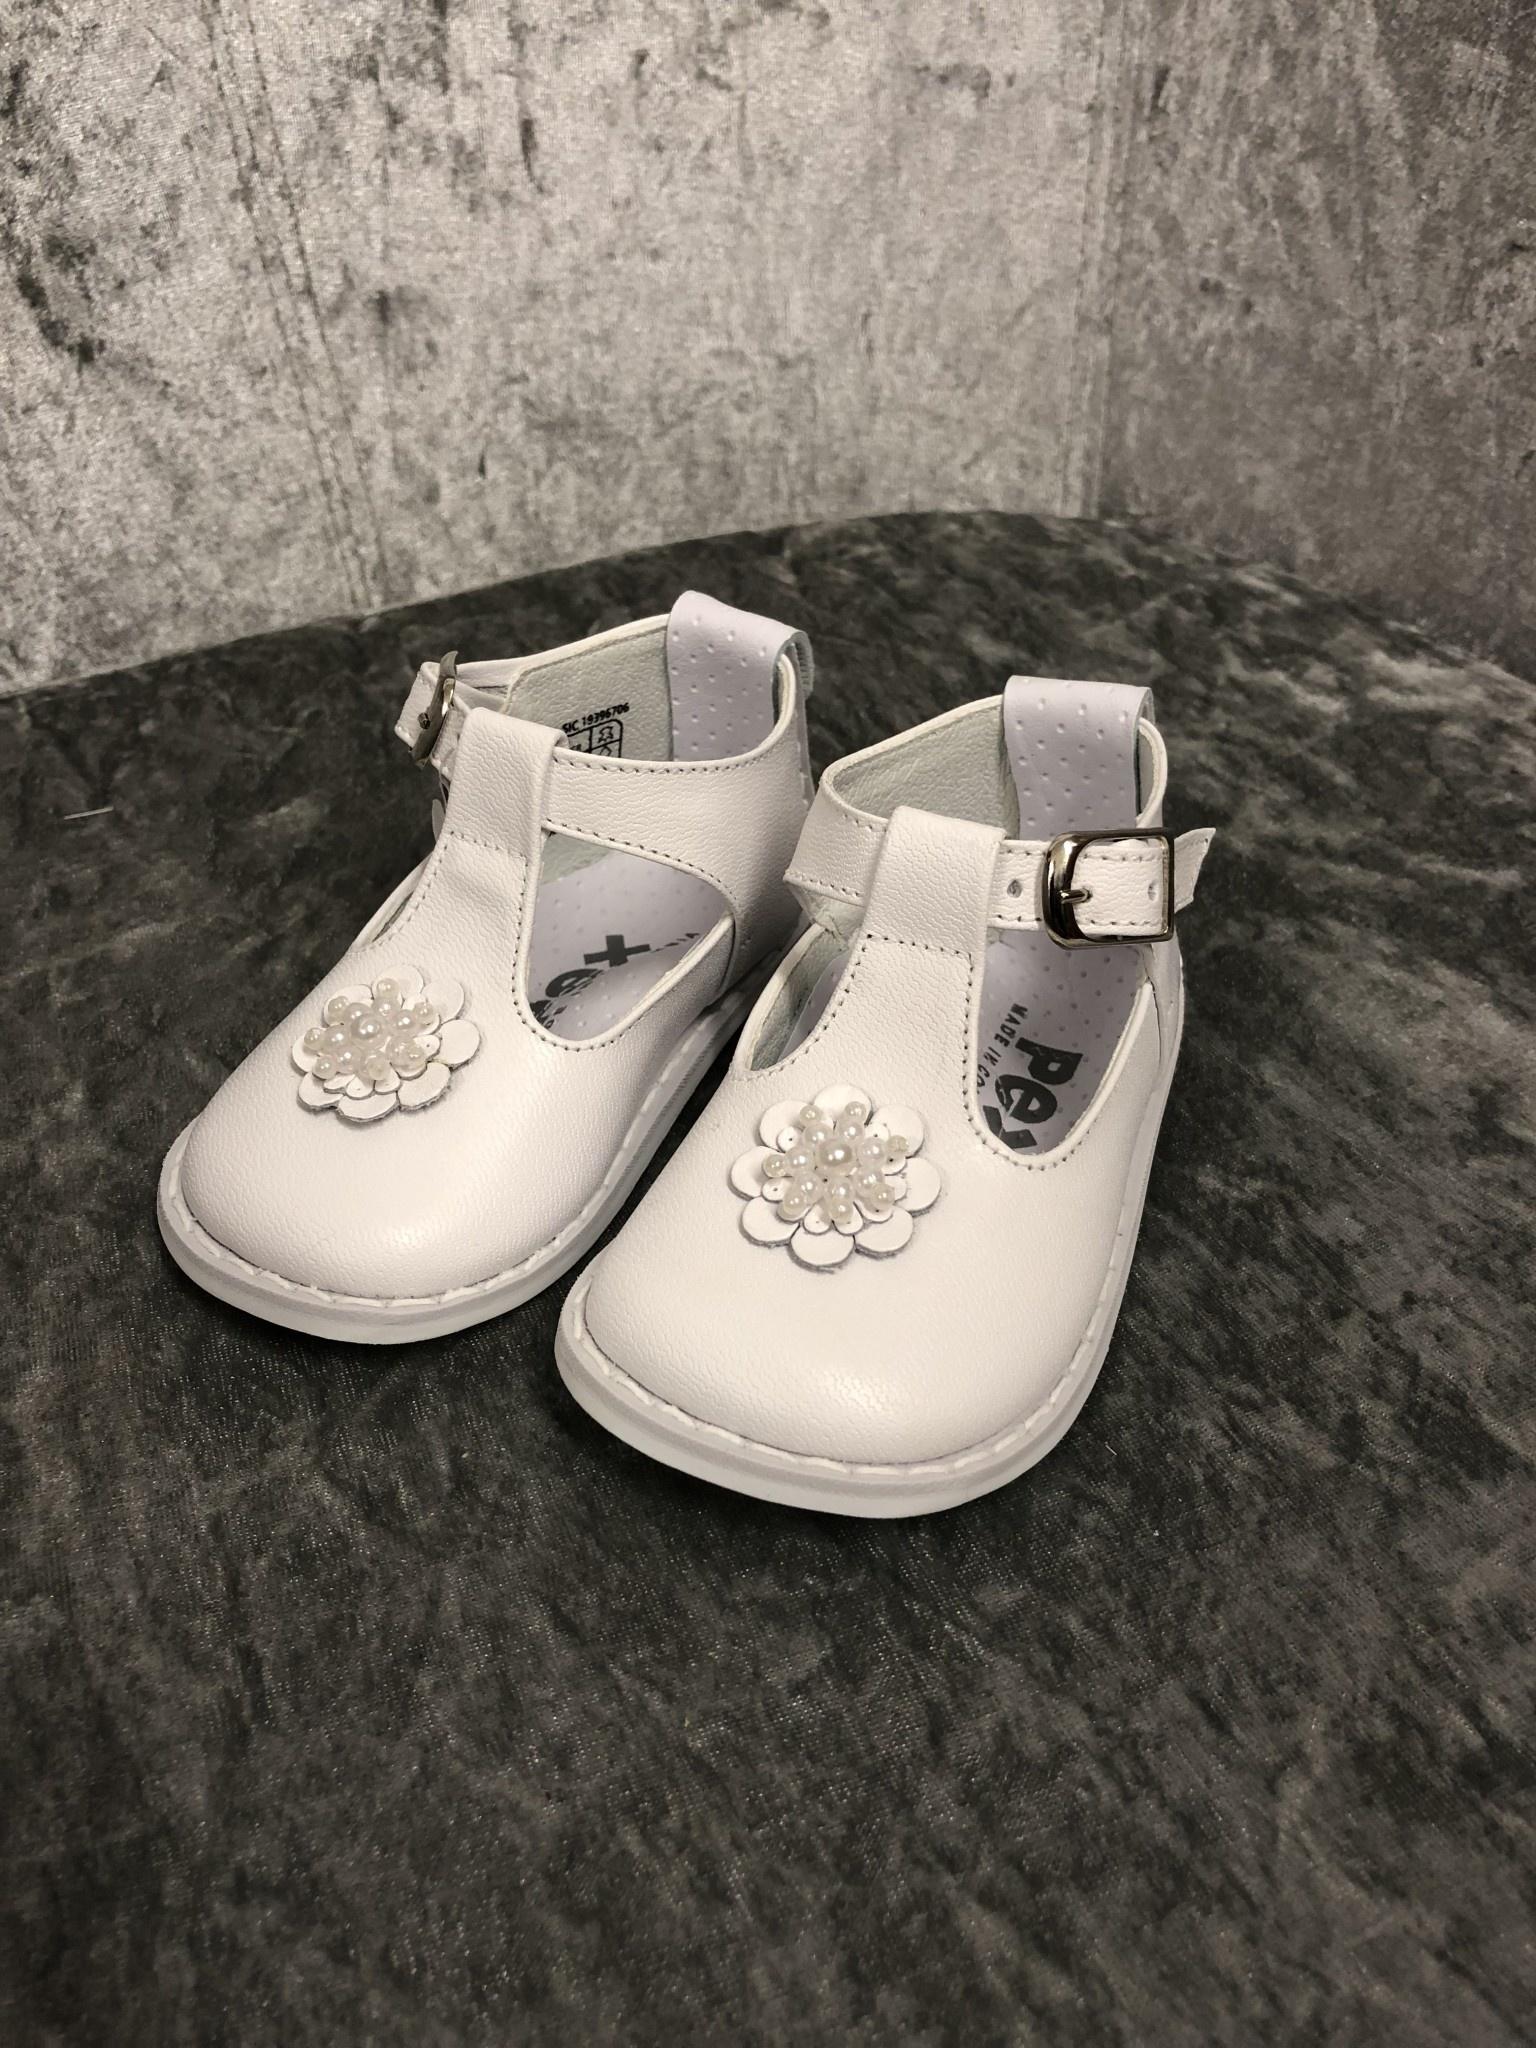 Pex Pex Eddie Girls Shoes With Bead Flower Size 22